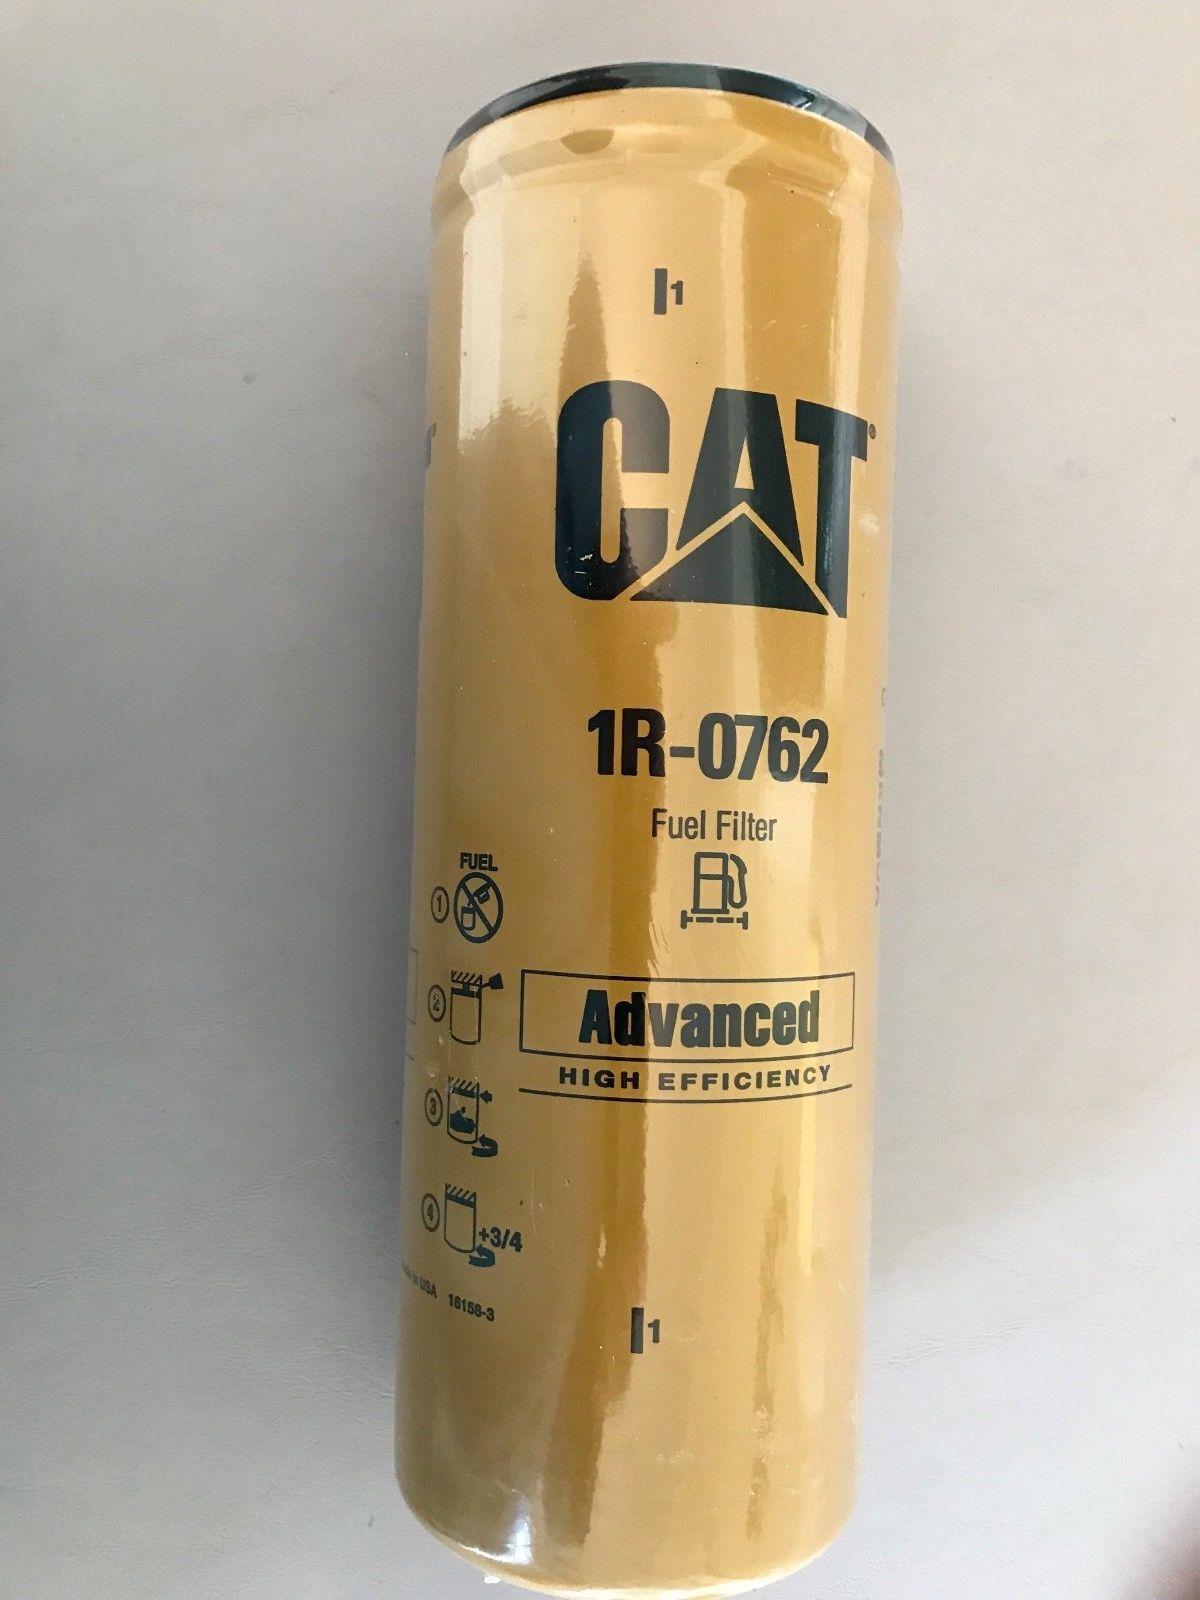 Available on Ebay #ebay 1R-0762 CAT Caterpillar Fuel Filter - New Sealed # caterpillar #heavyequipment #ebay #heavyequipment